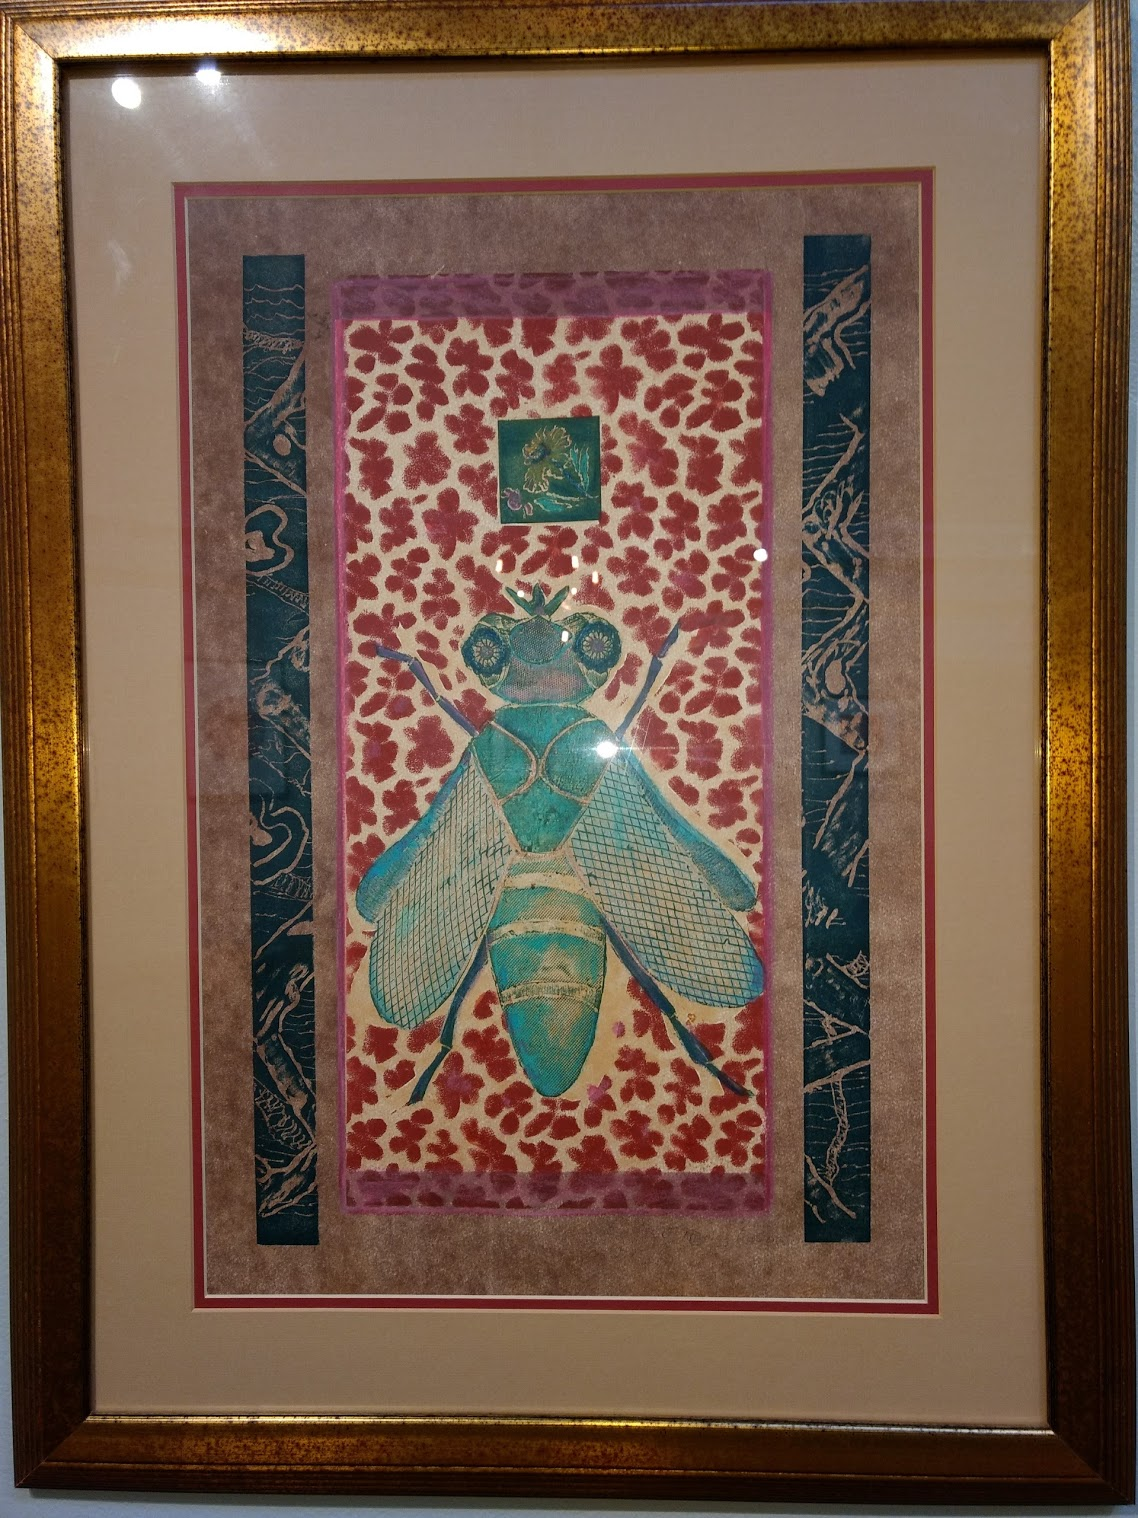 Kendal Resident Ann Lasusa S Work Exhibited At The Art Gallery In Rockefeller State Park Preserve Resident Life At Kendal On Hudson